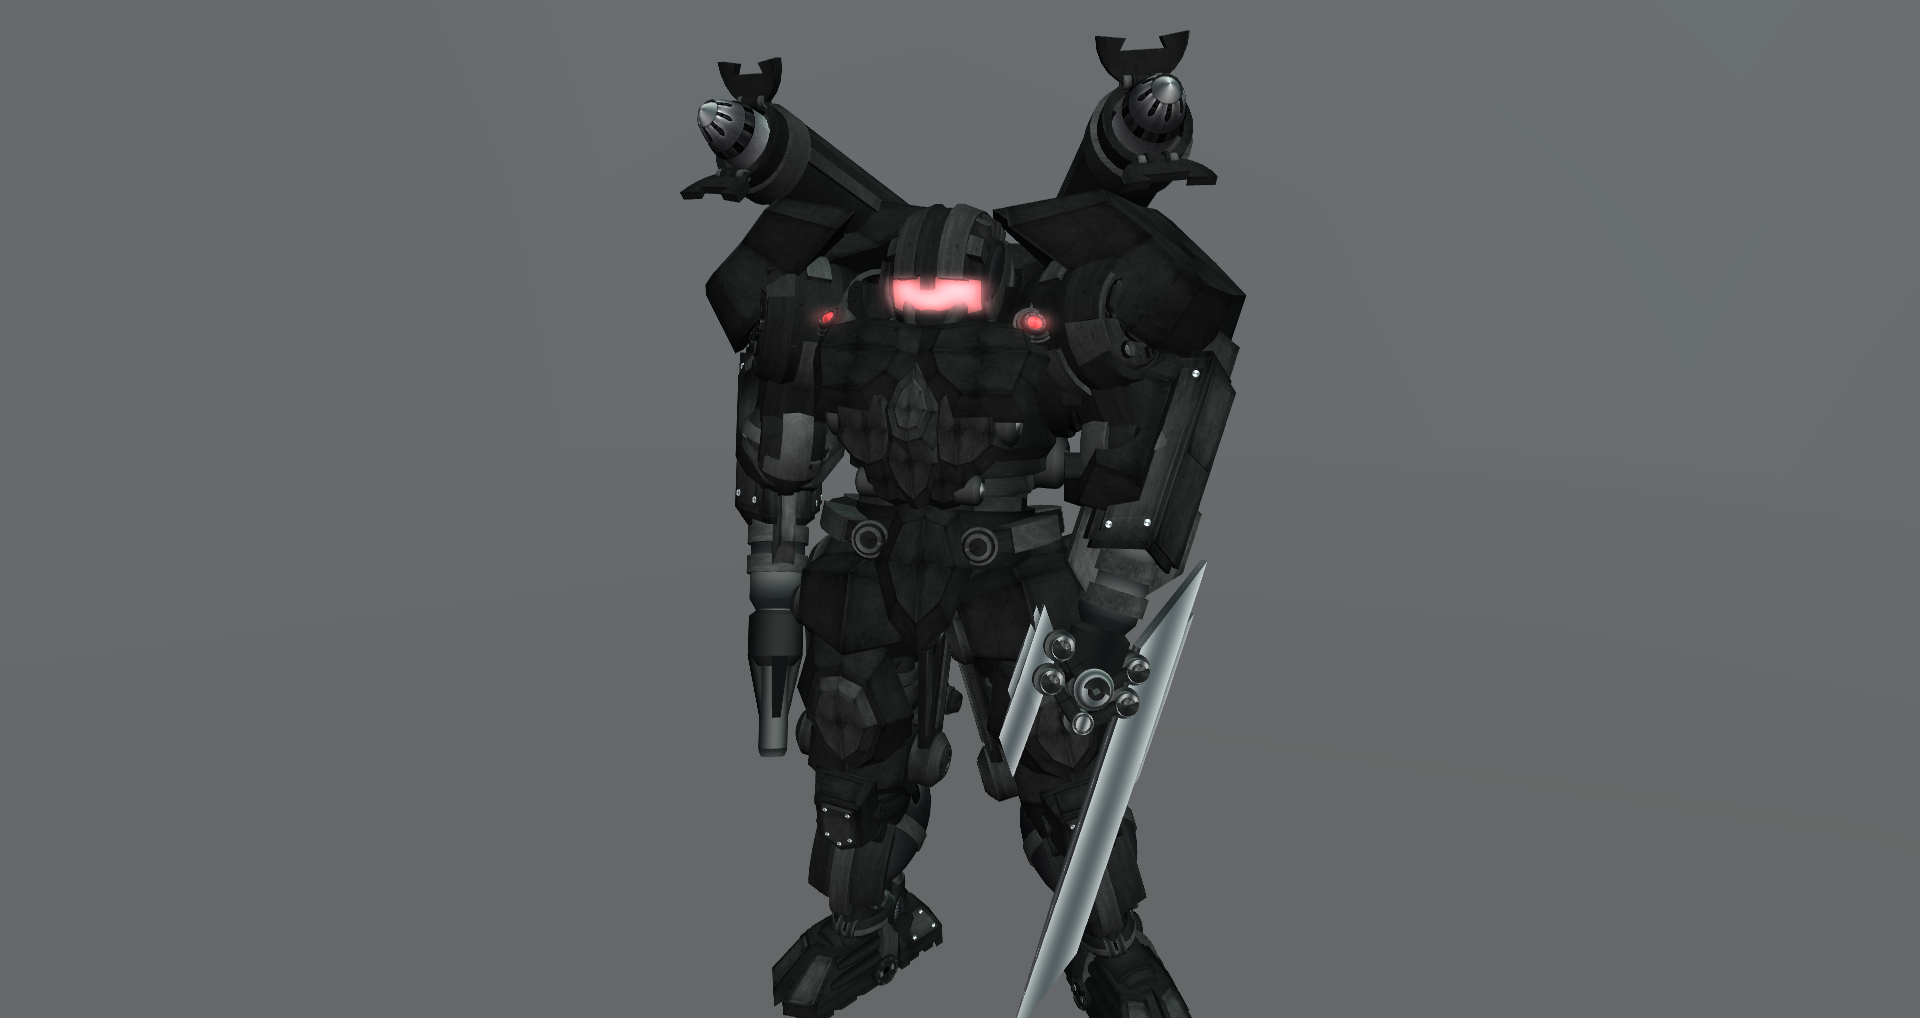 3D Futuristic Armor Suit 2 by Zarthak on DeviantArt